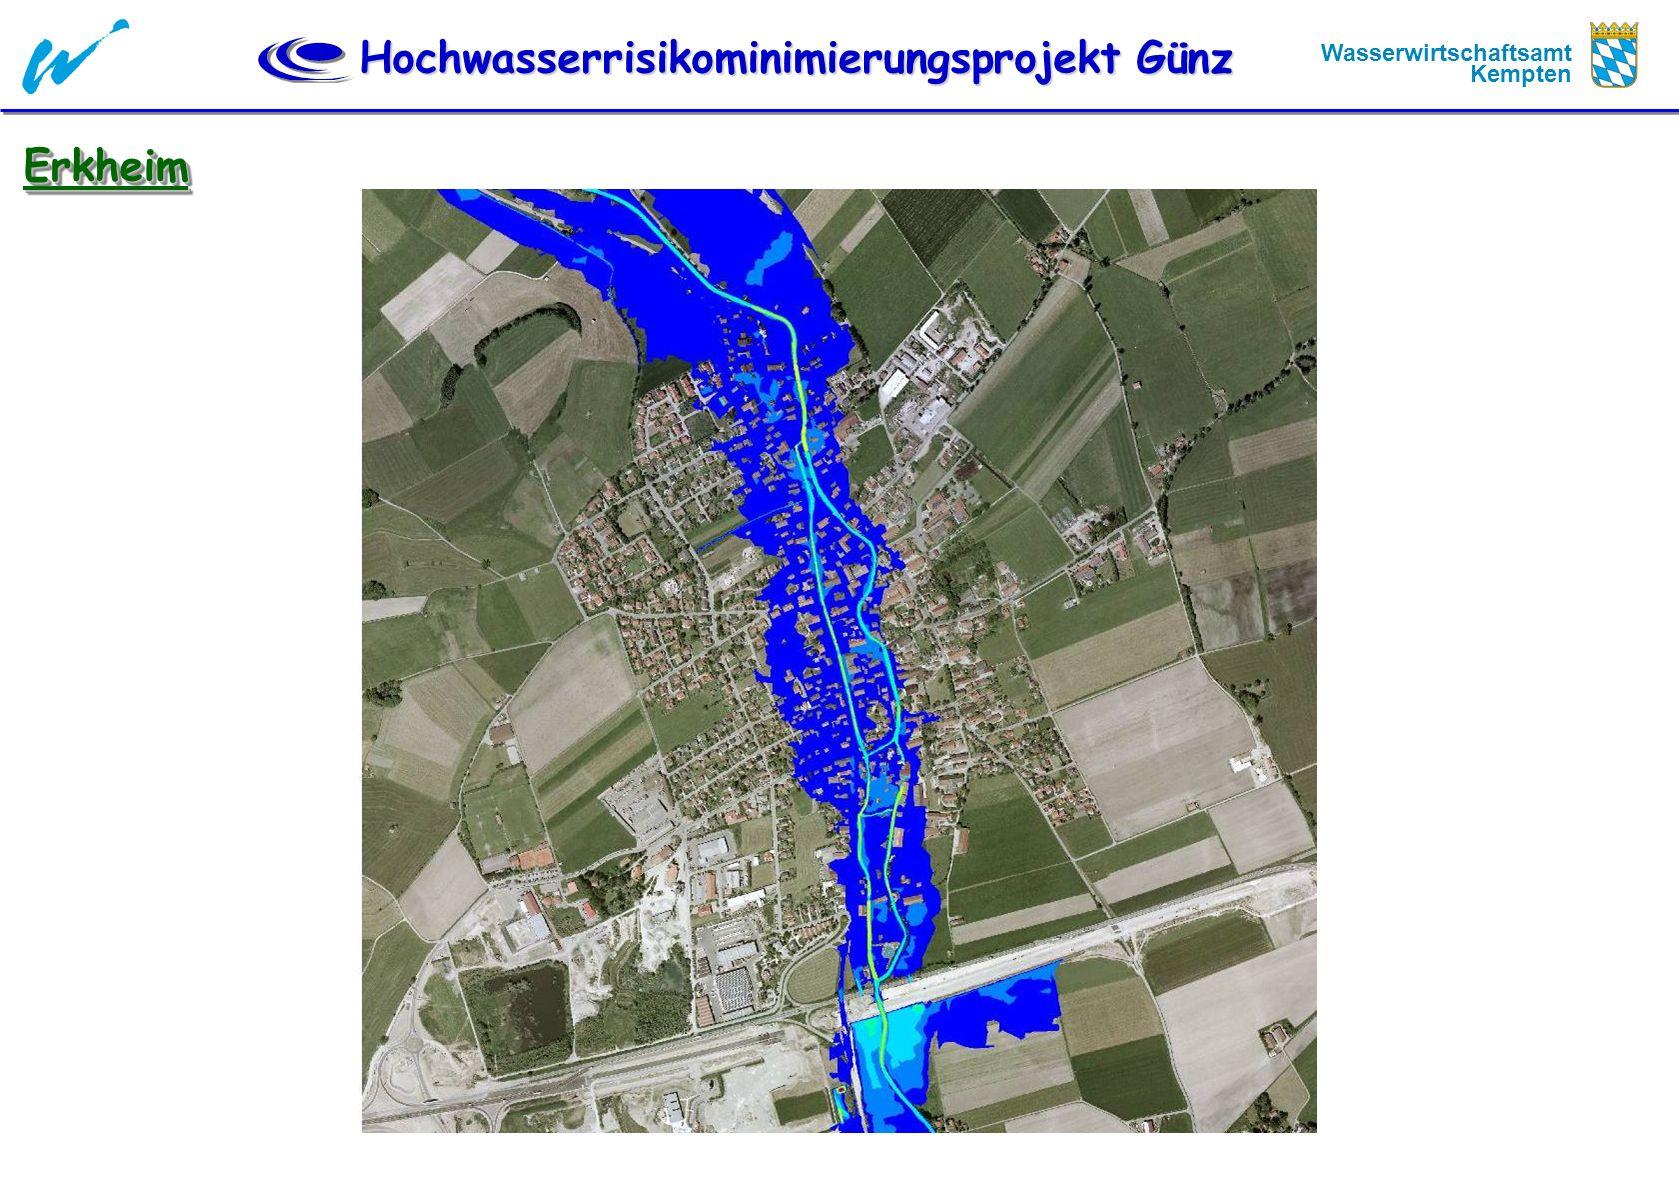 Hochwasserrisikominimierungsprojekt Günz Wasserwirtschaftsamt Kempten ErkheimErkheim